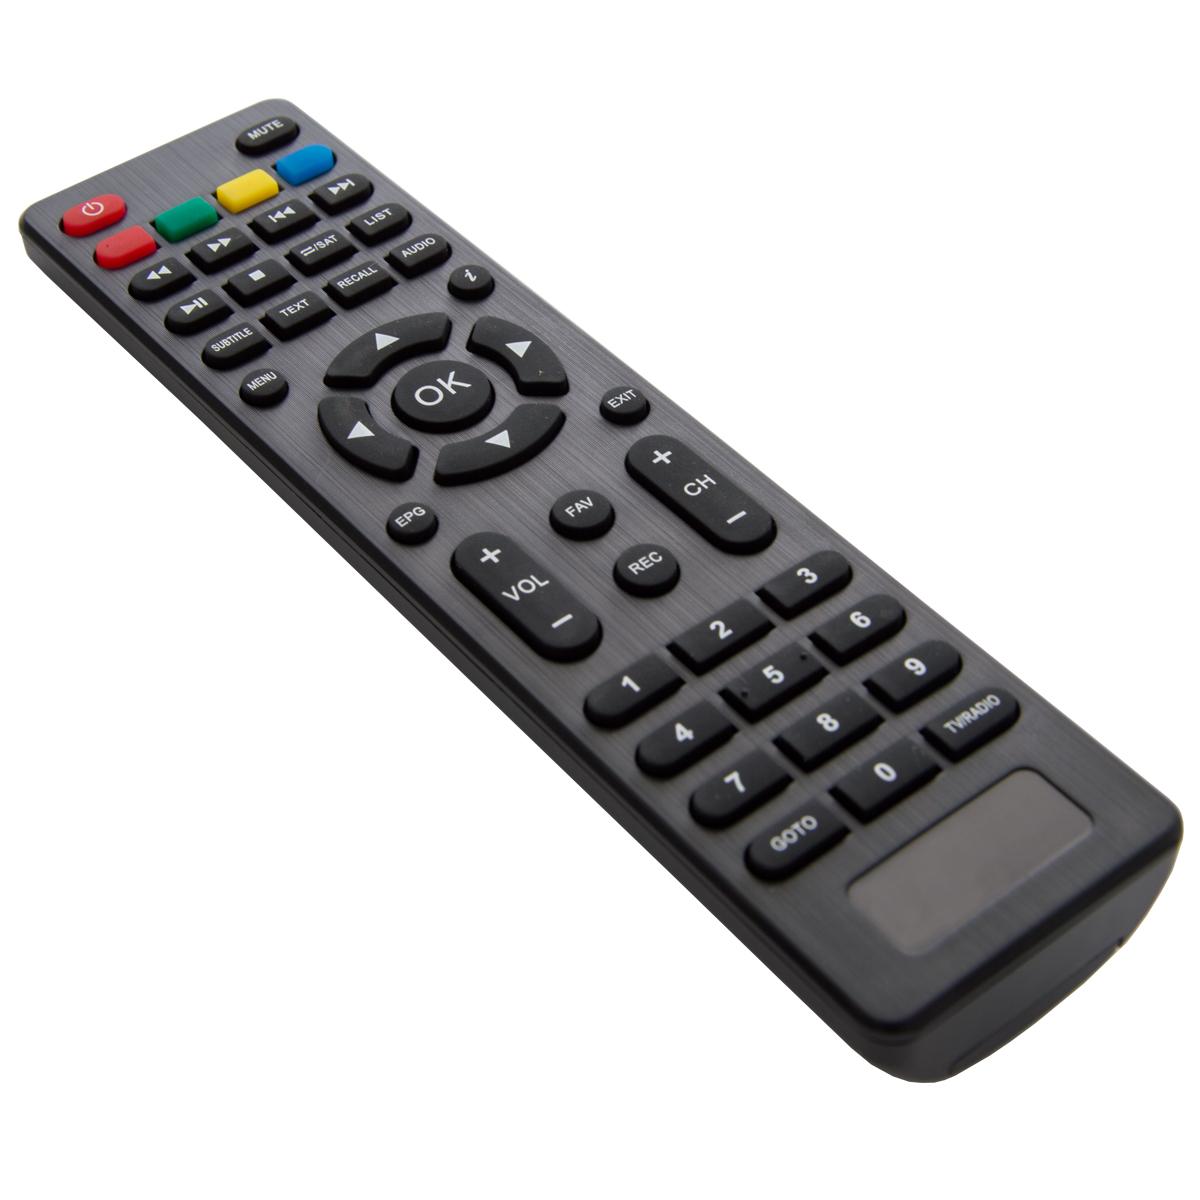 Nokta HD 1461 FTA Digital Sat Receiver DVB-S2 USB Scart HDMI HDTV FullHD